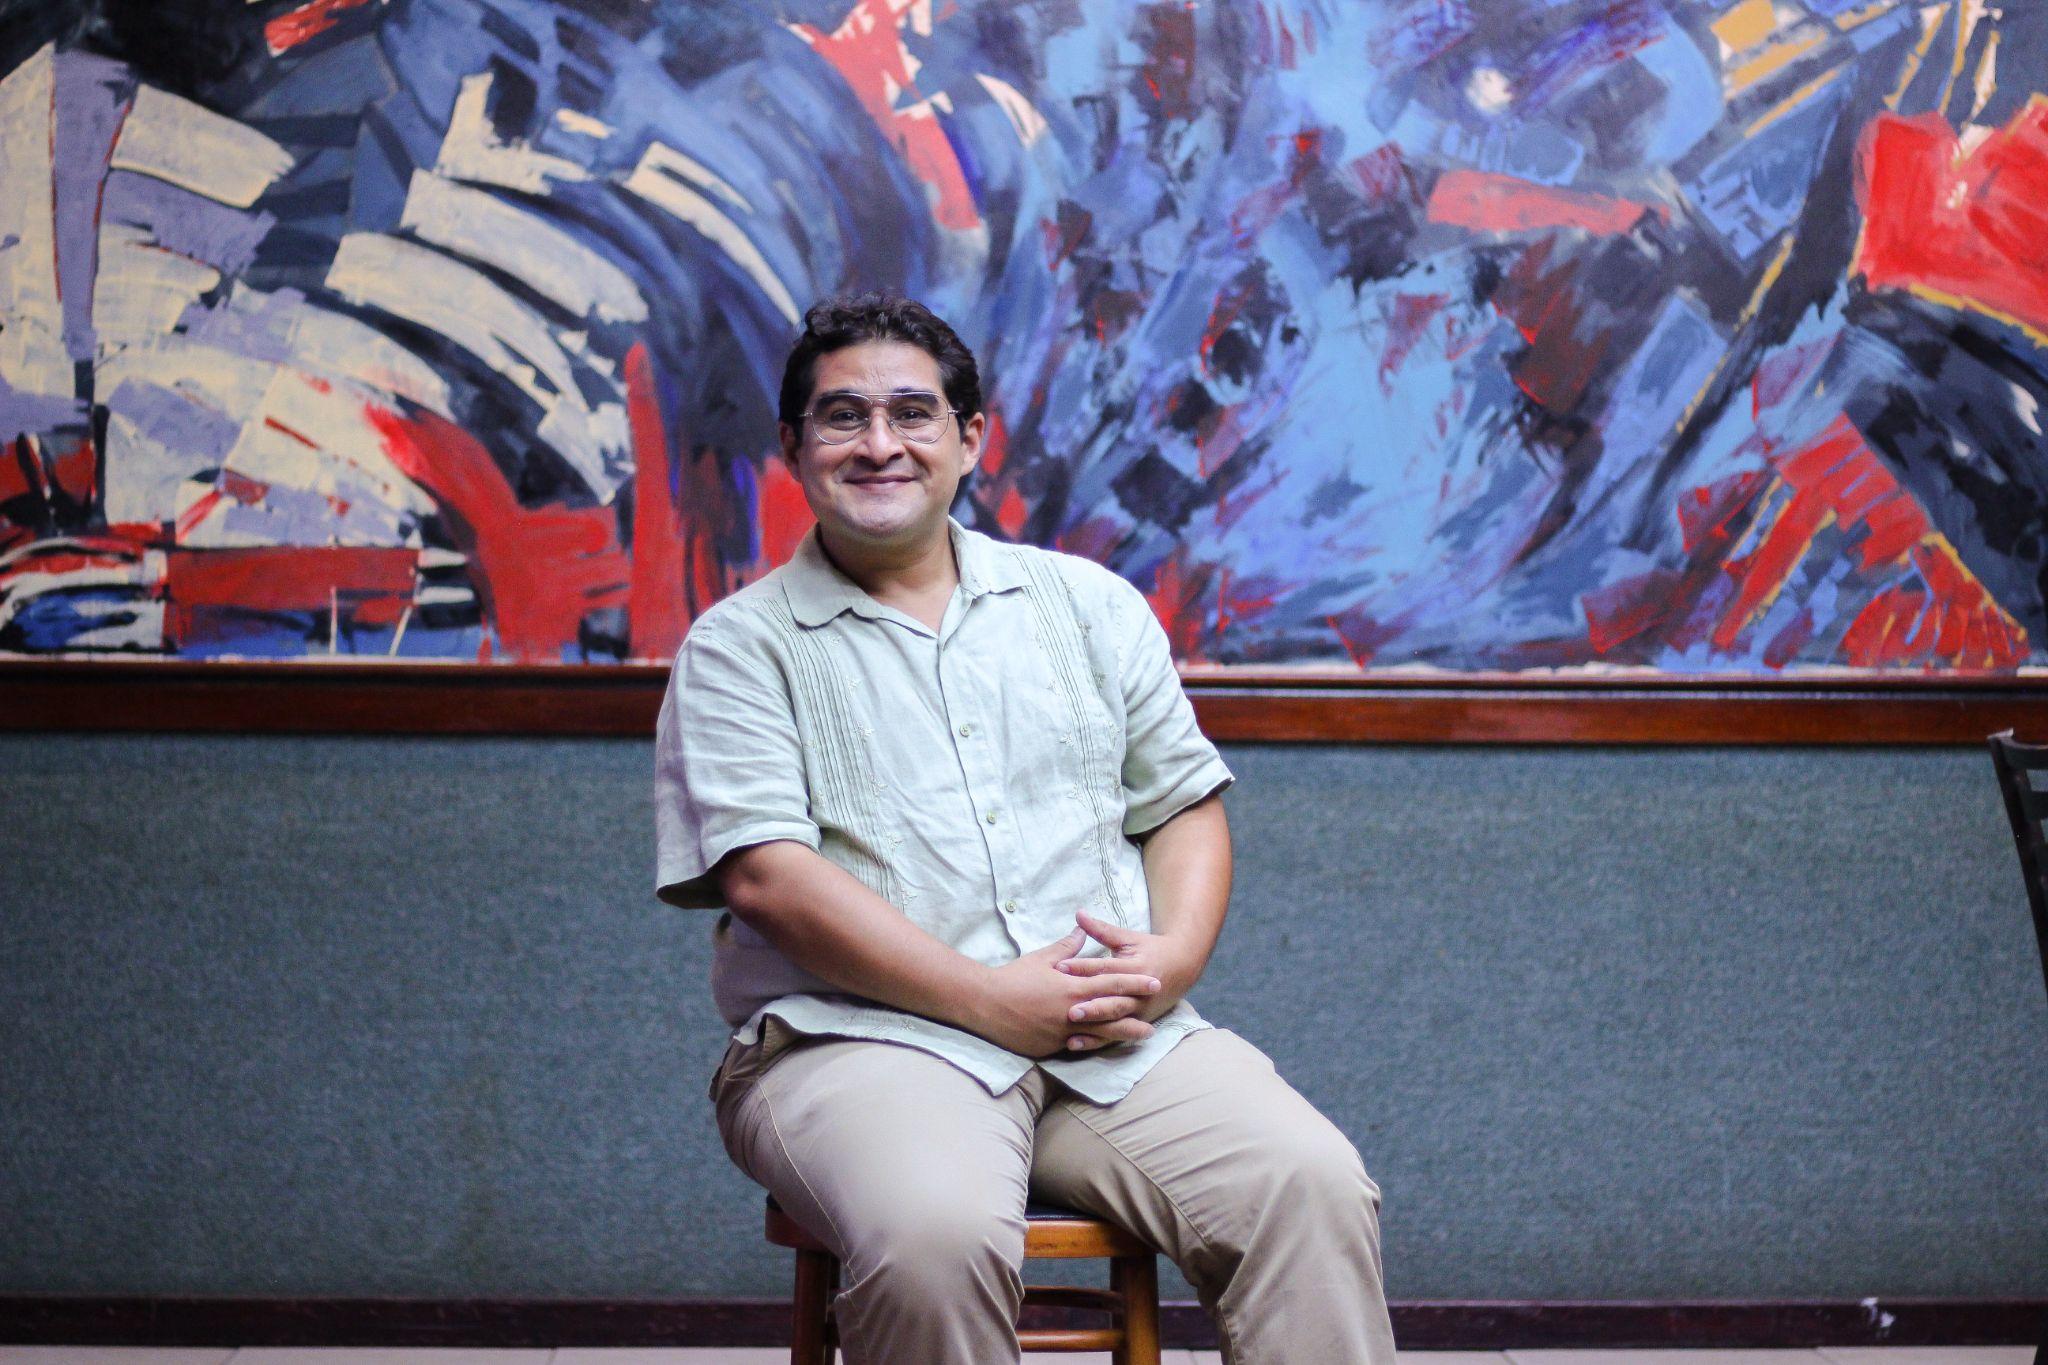 cuxum, actor regional yucateco